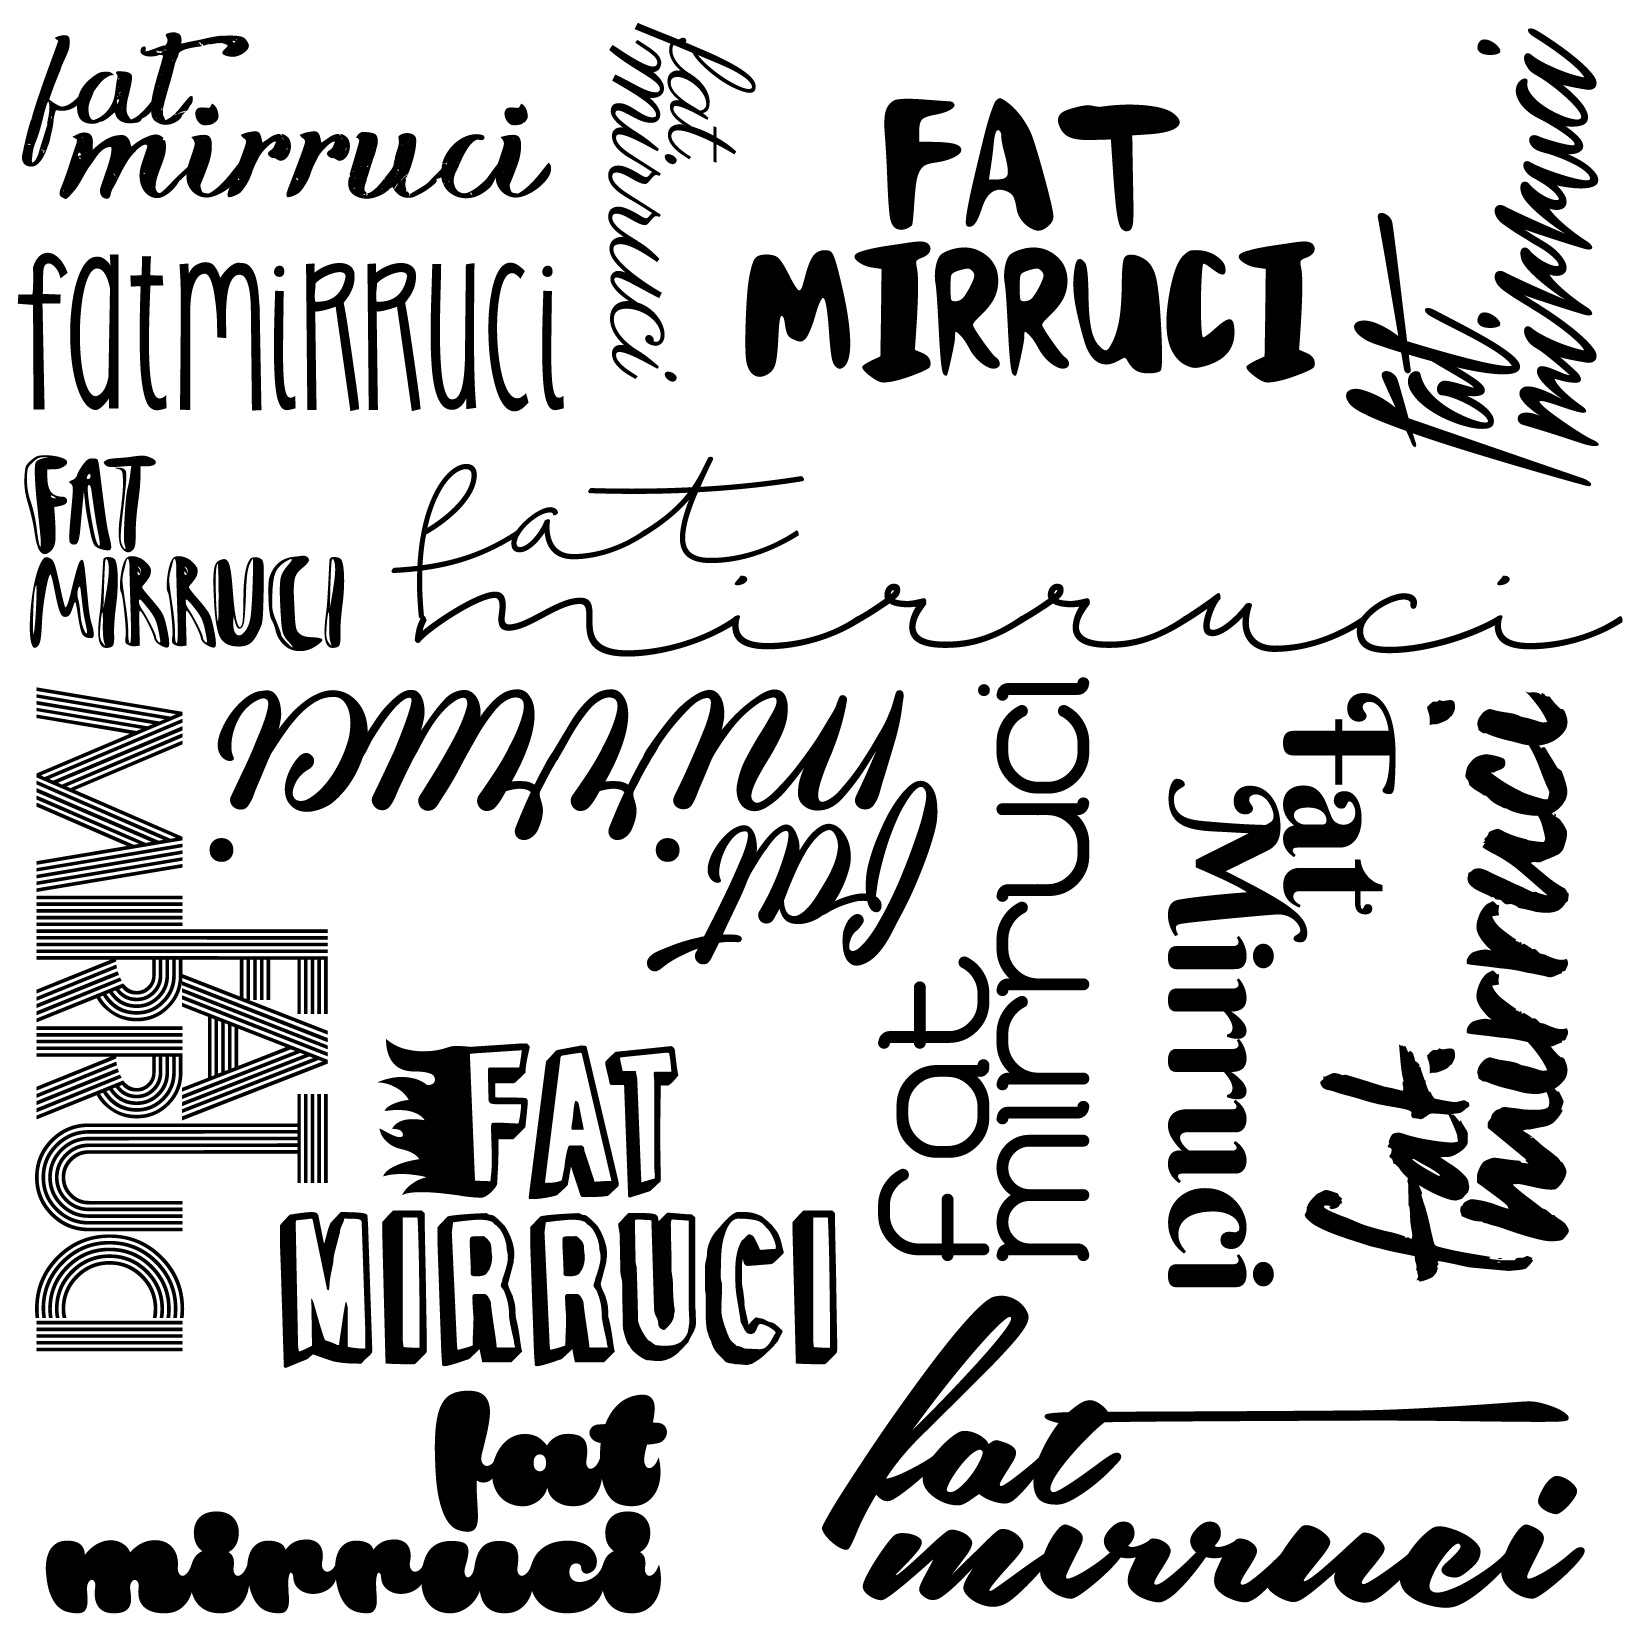 Fatmirruci 03